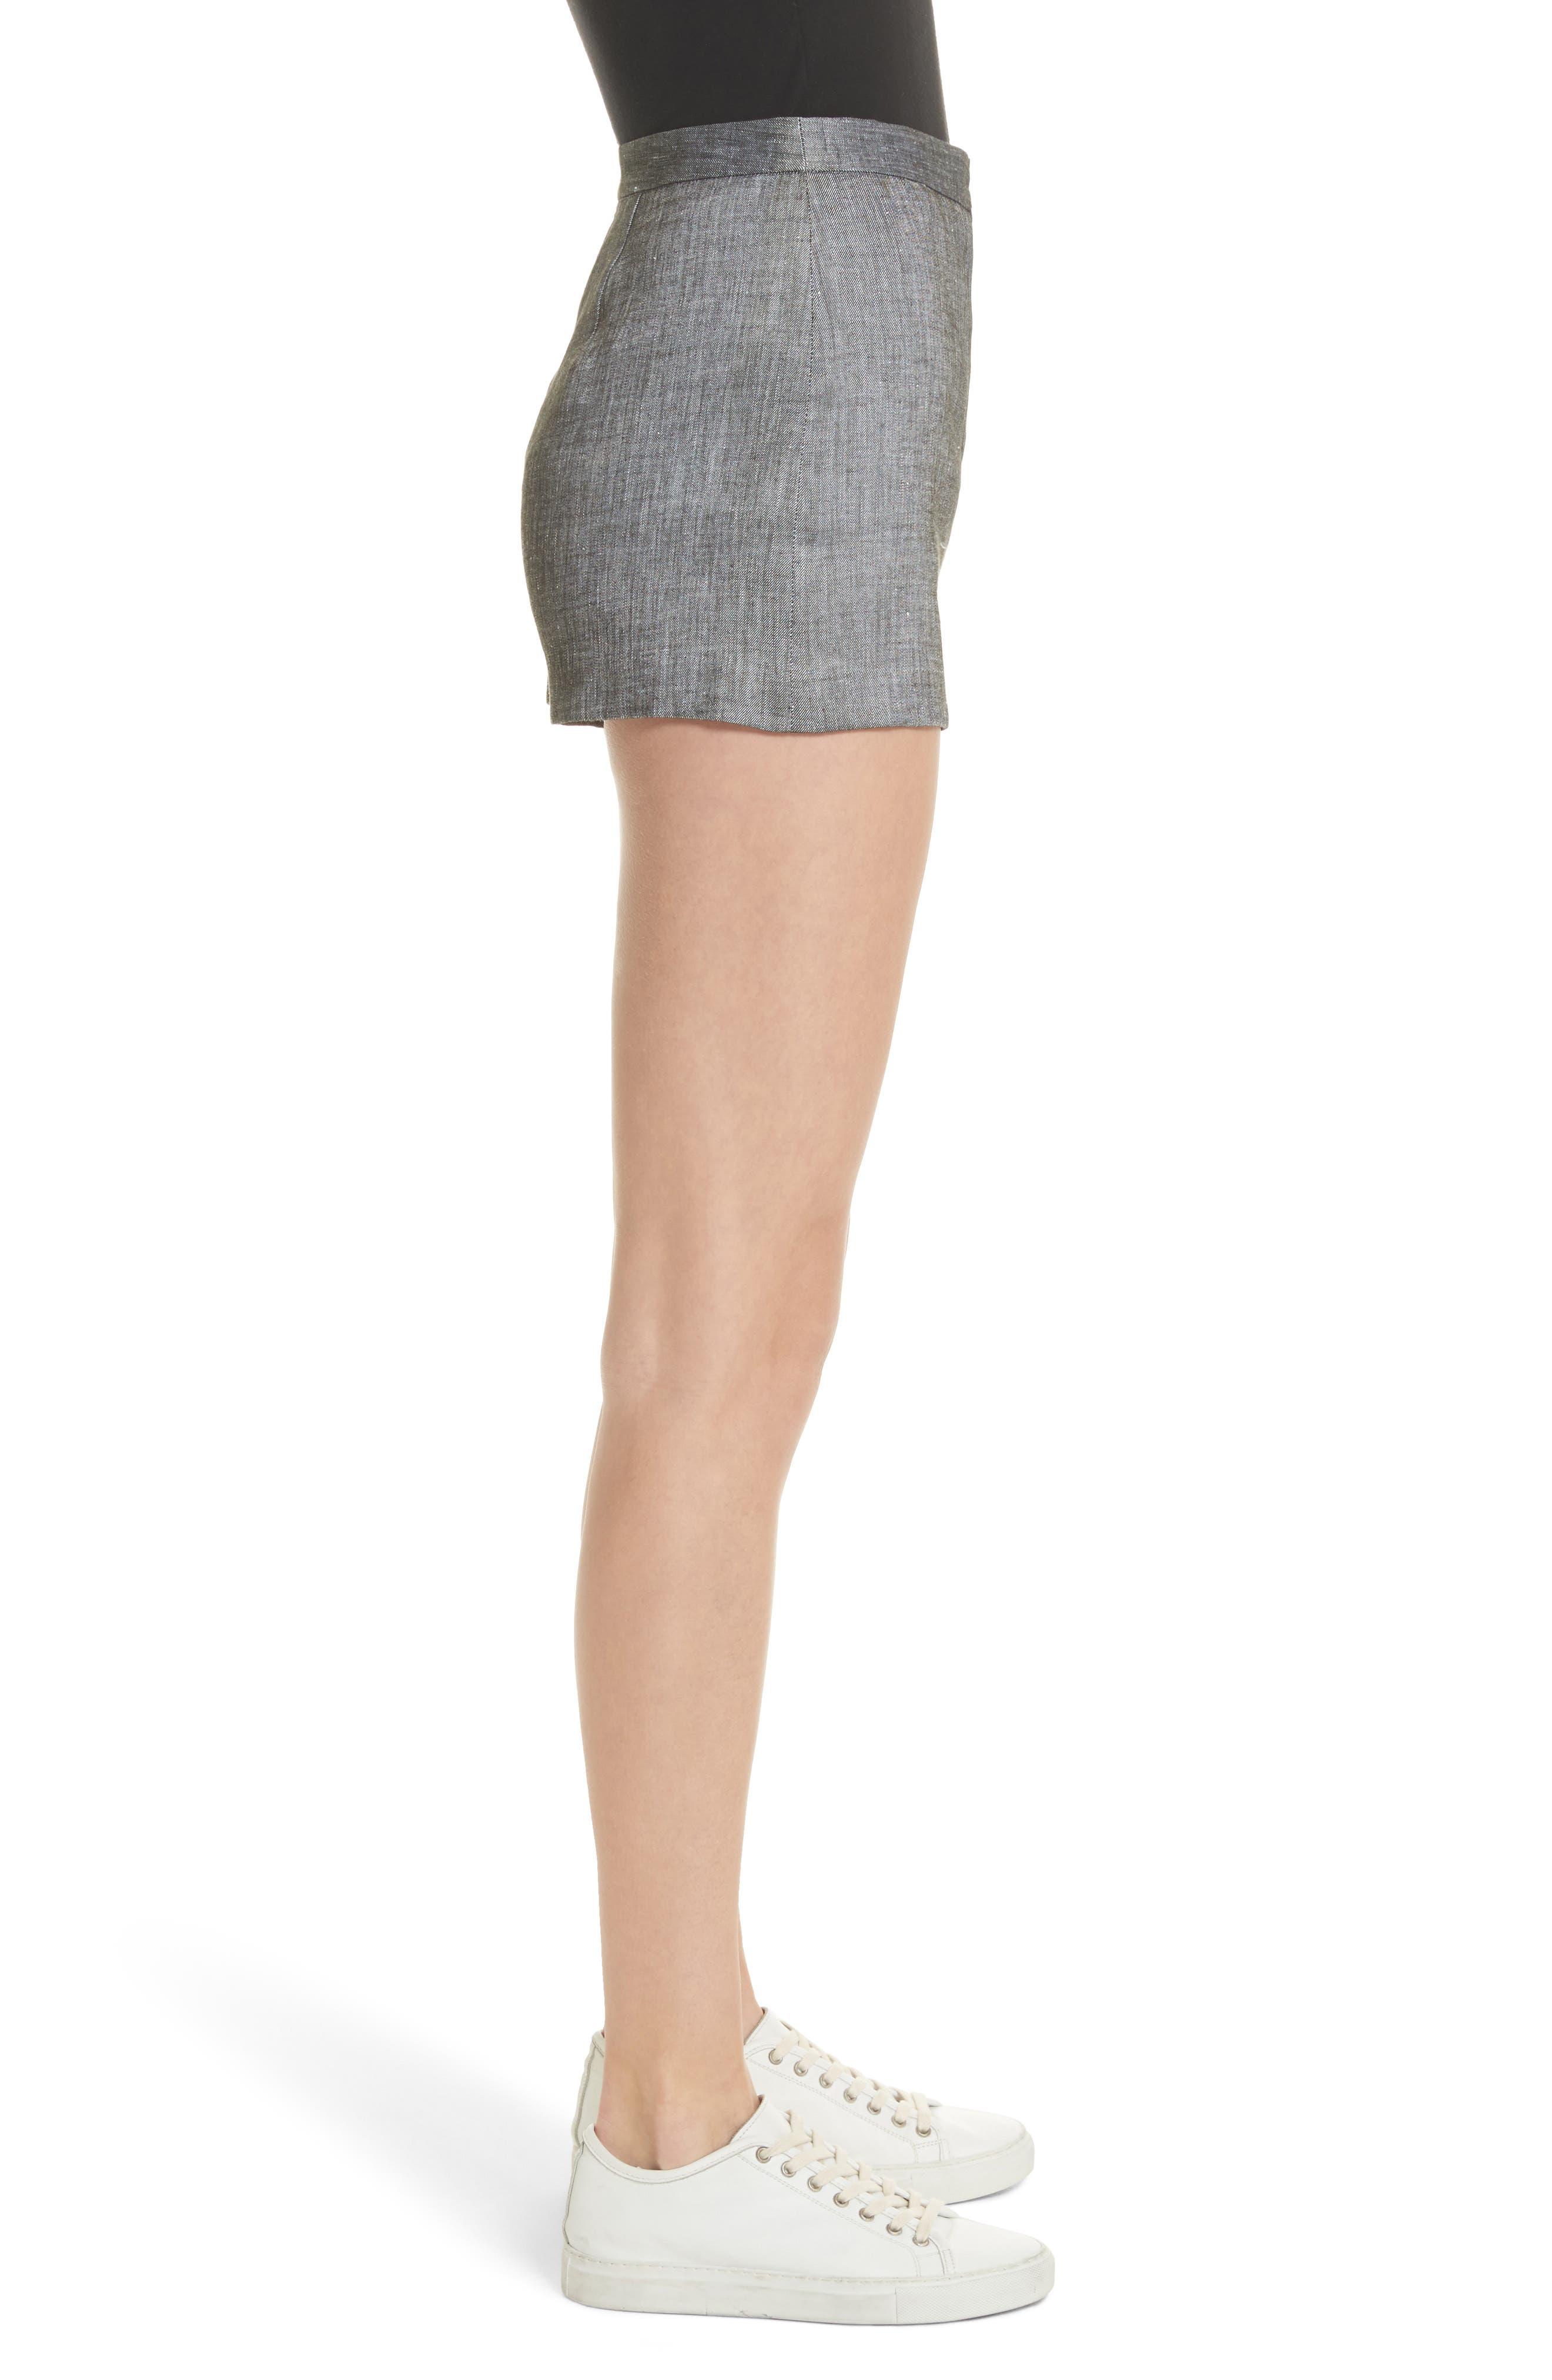 Trudee High Waist Shorts,                             Alternate thumbnail 3, color,                             309